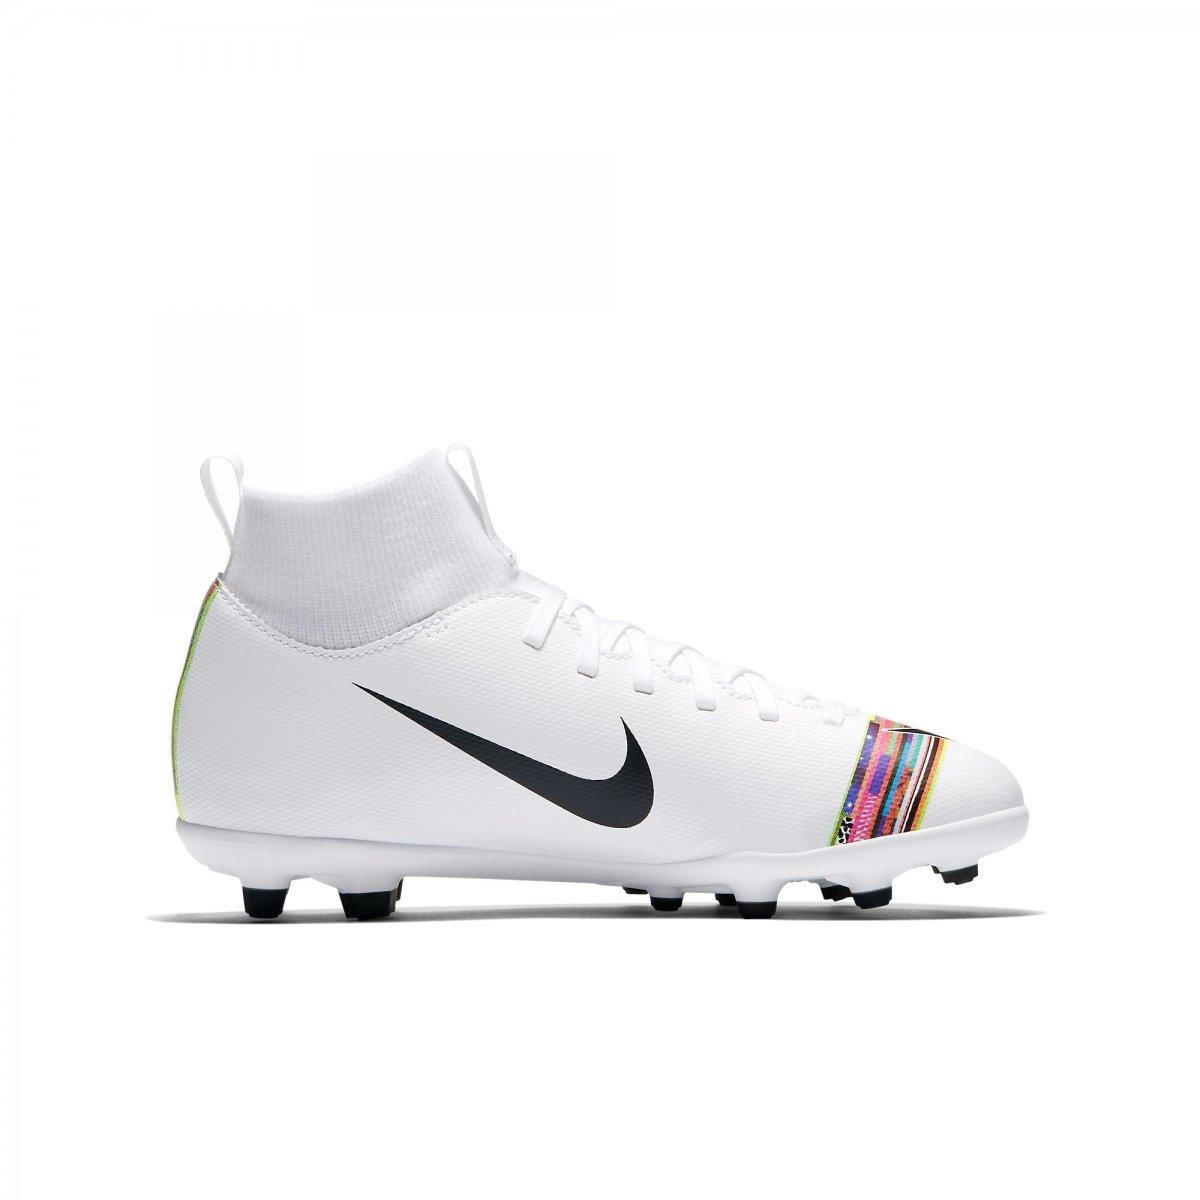 3980879f30 Chuteira Campo Infantil Nike Superfly 6 Club FG MG AJ3115-109 ...